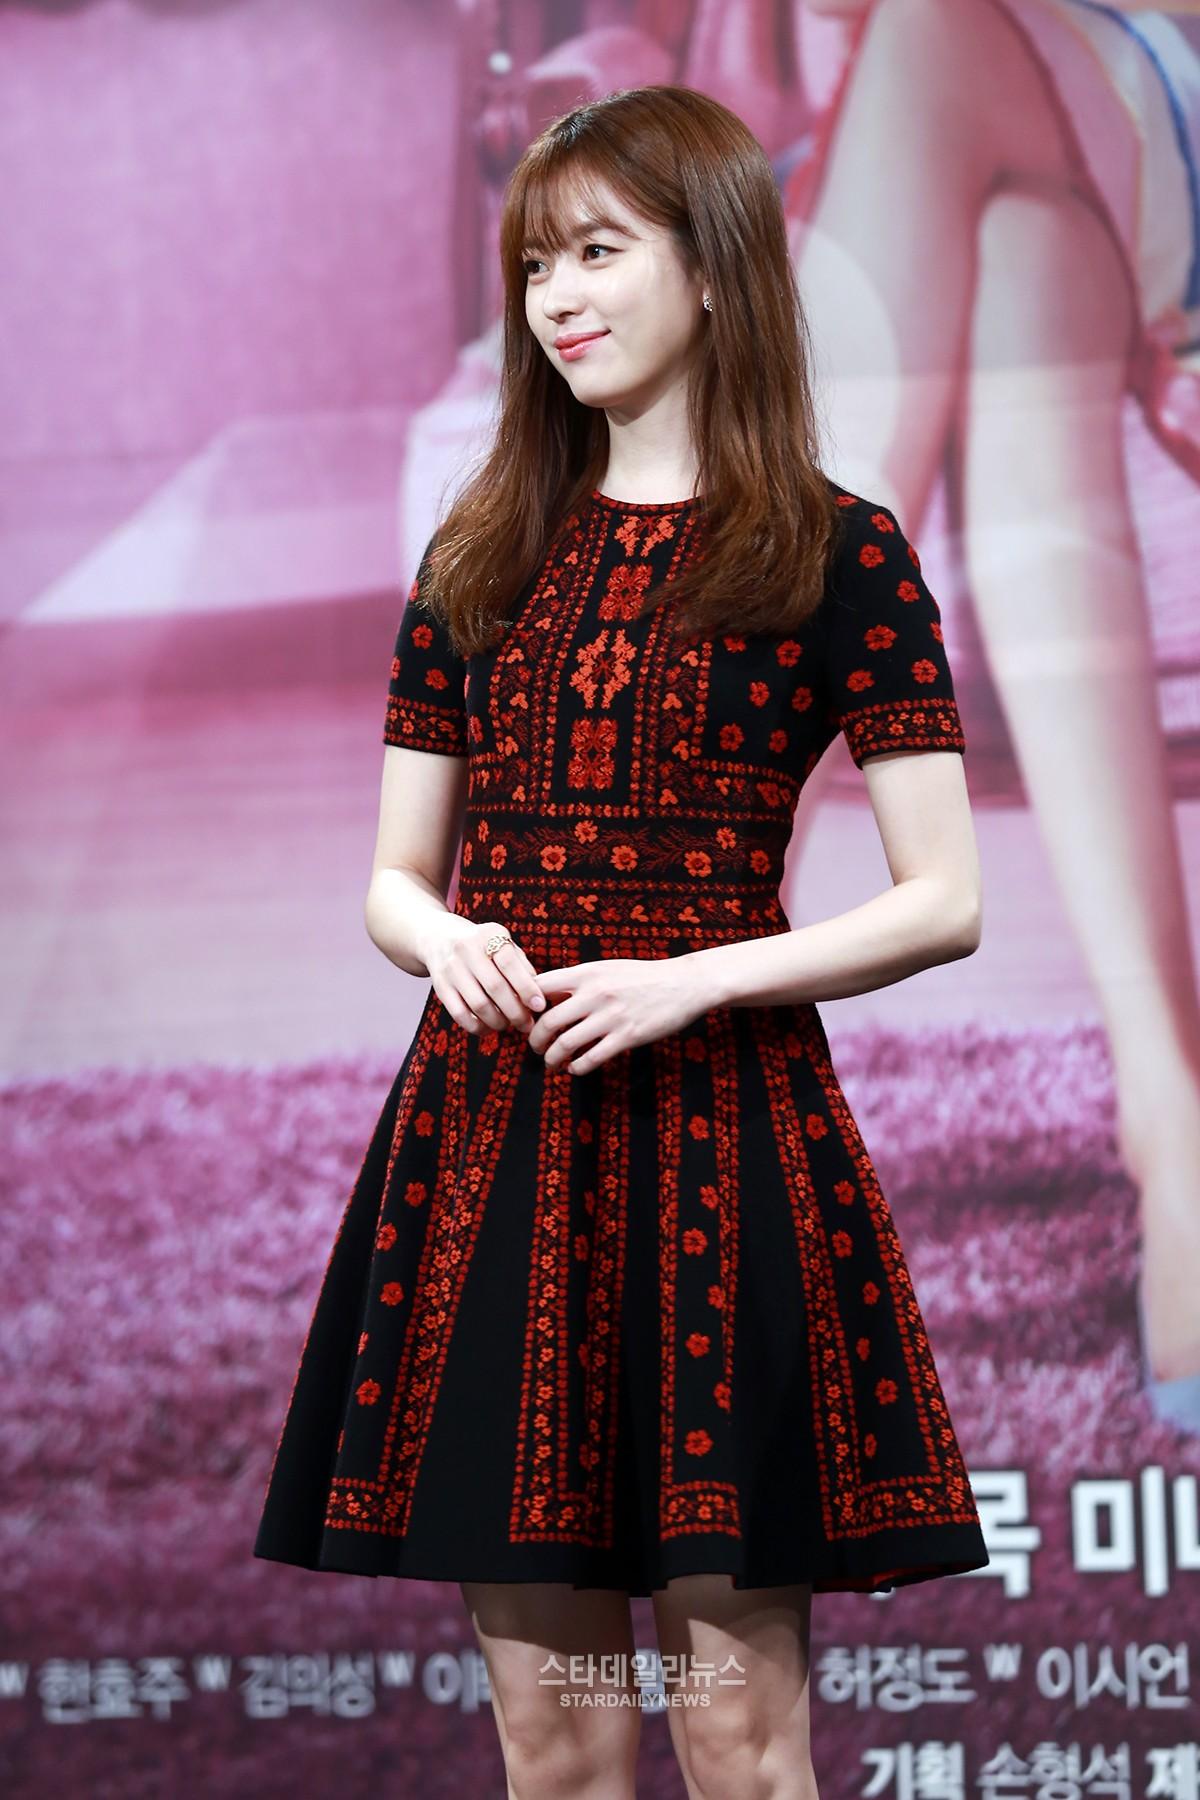 han-hyo-joo-w-press-conference